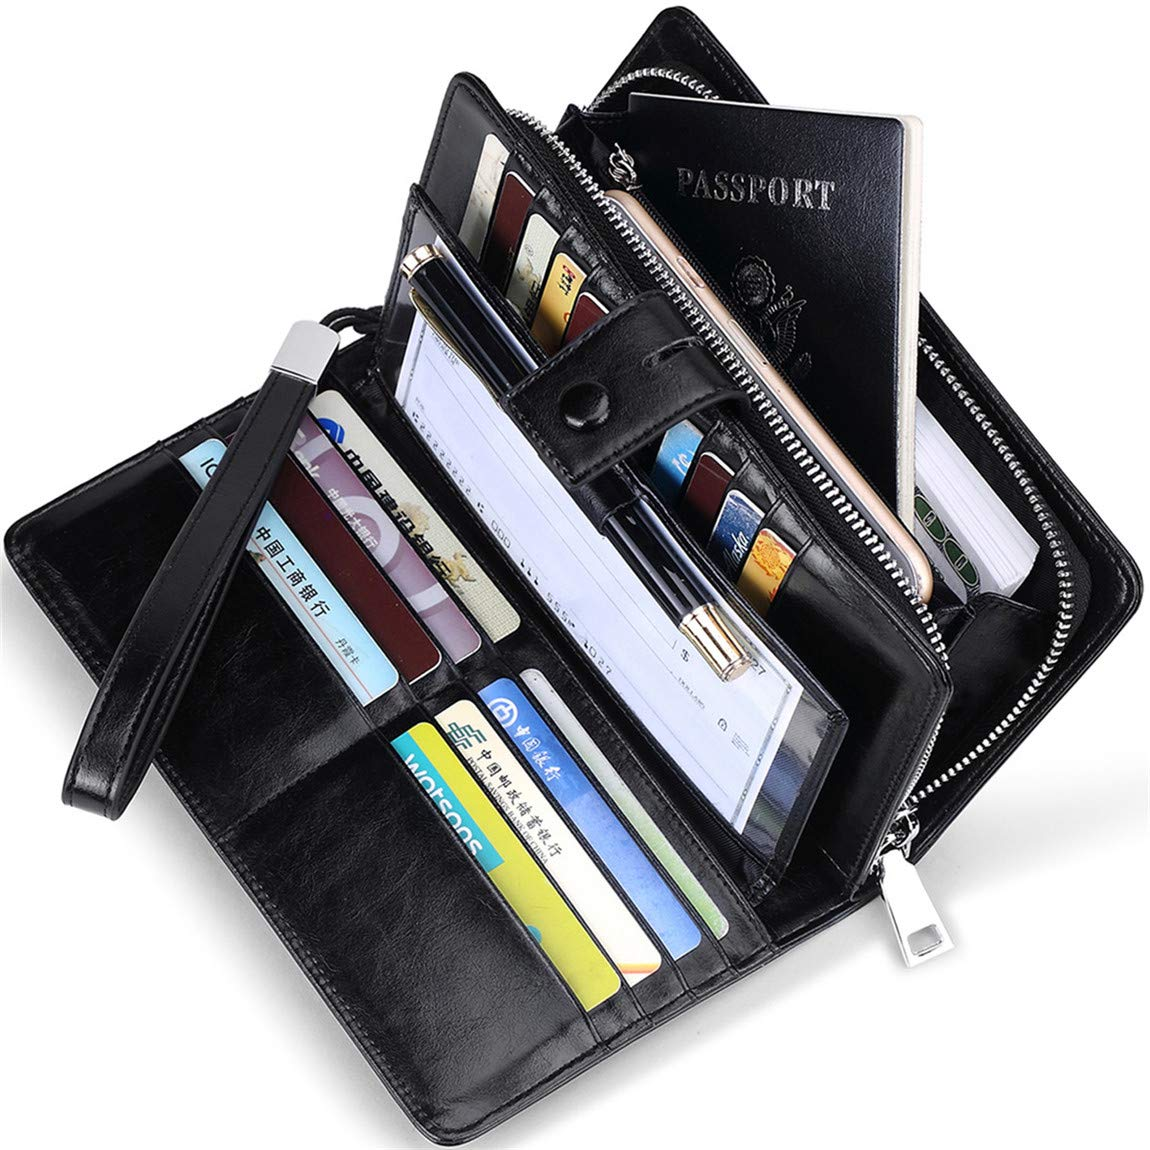 Huztencor Women's Big Fat RFID Blocking Real Leather Wallet Clutch Organizer Checkbook Holder Huz-RFID-117